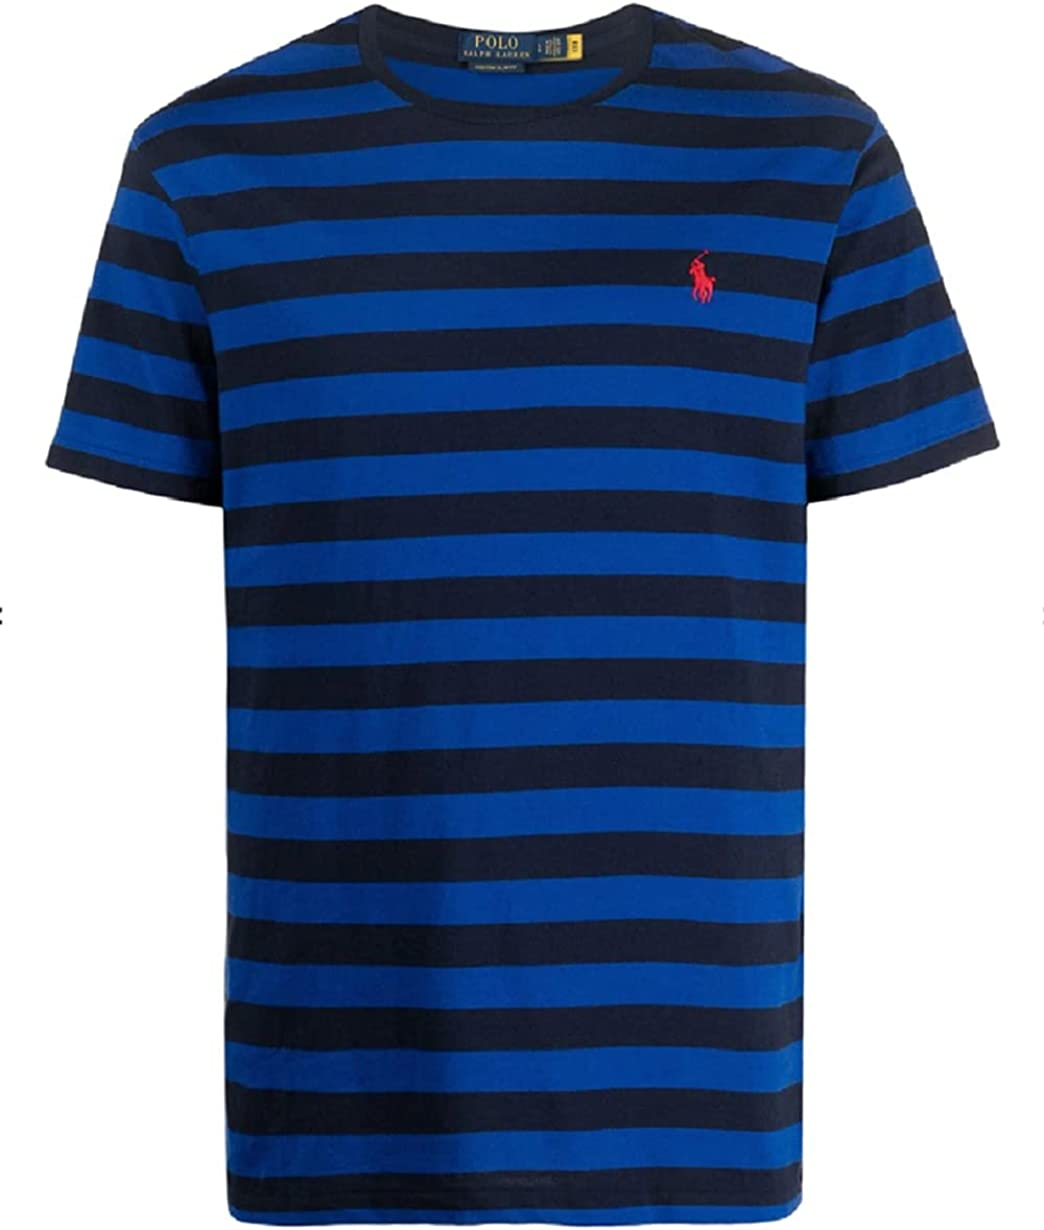 Polo Ralph free Lauren 2021 model Men's Pony T-Shirt Neck Crew Logo